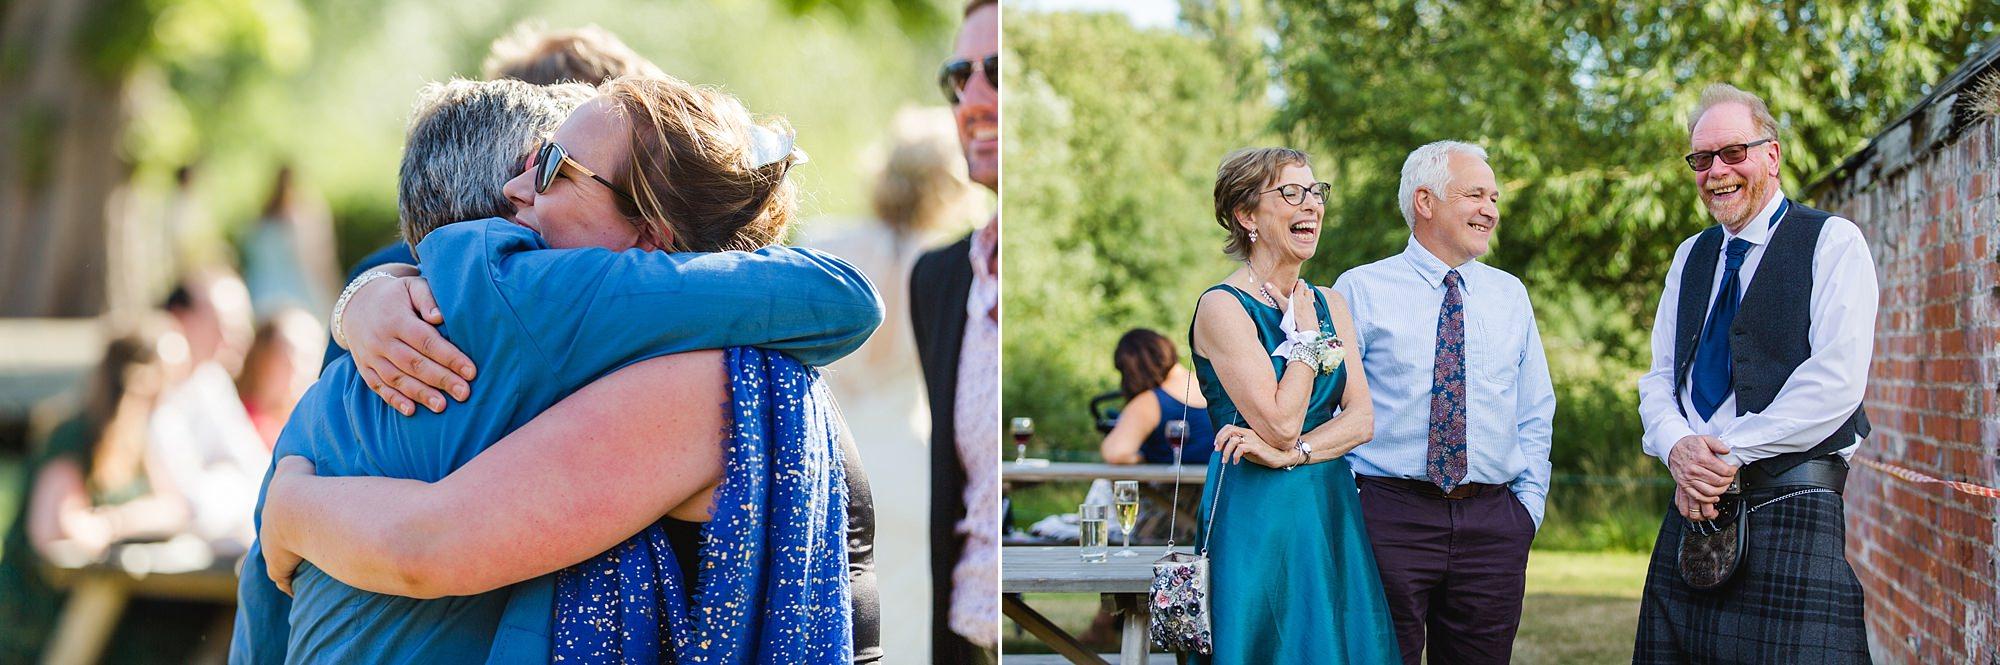 Isis Farmhouse Oxford Wedding guests having fun